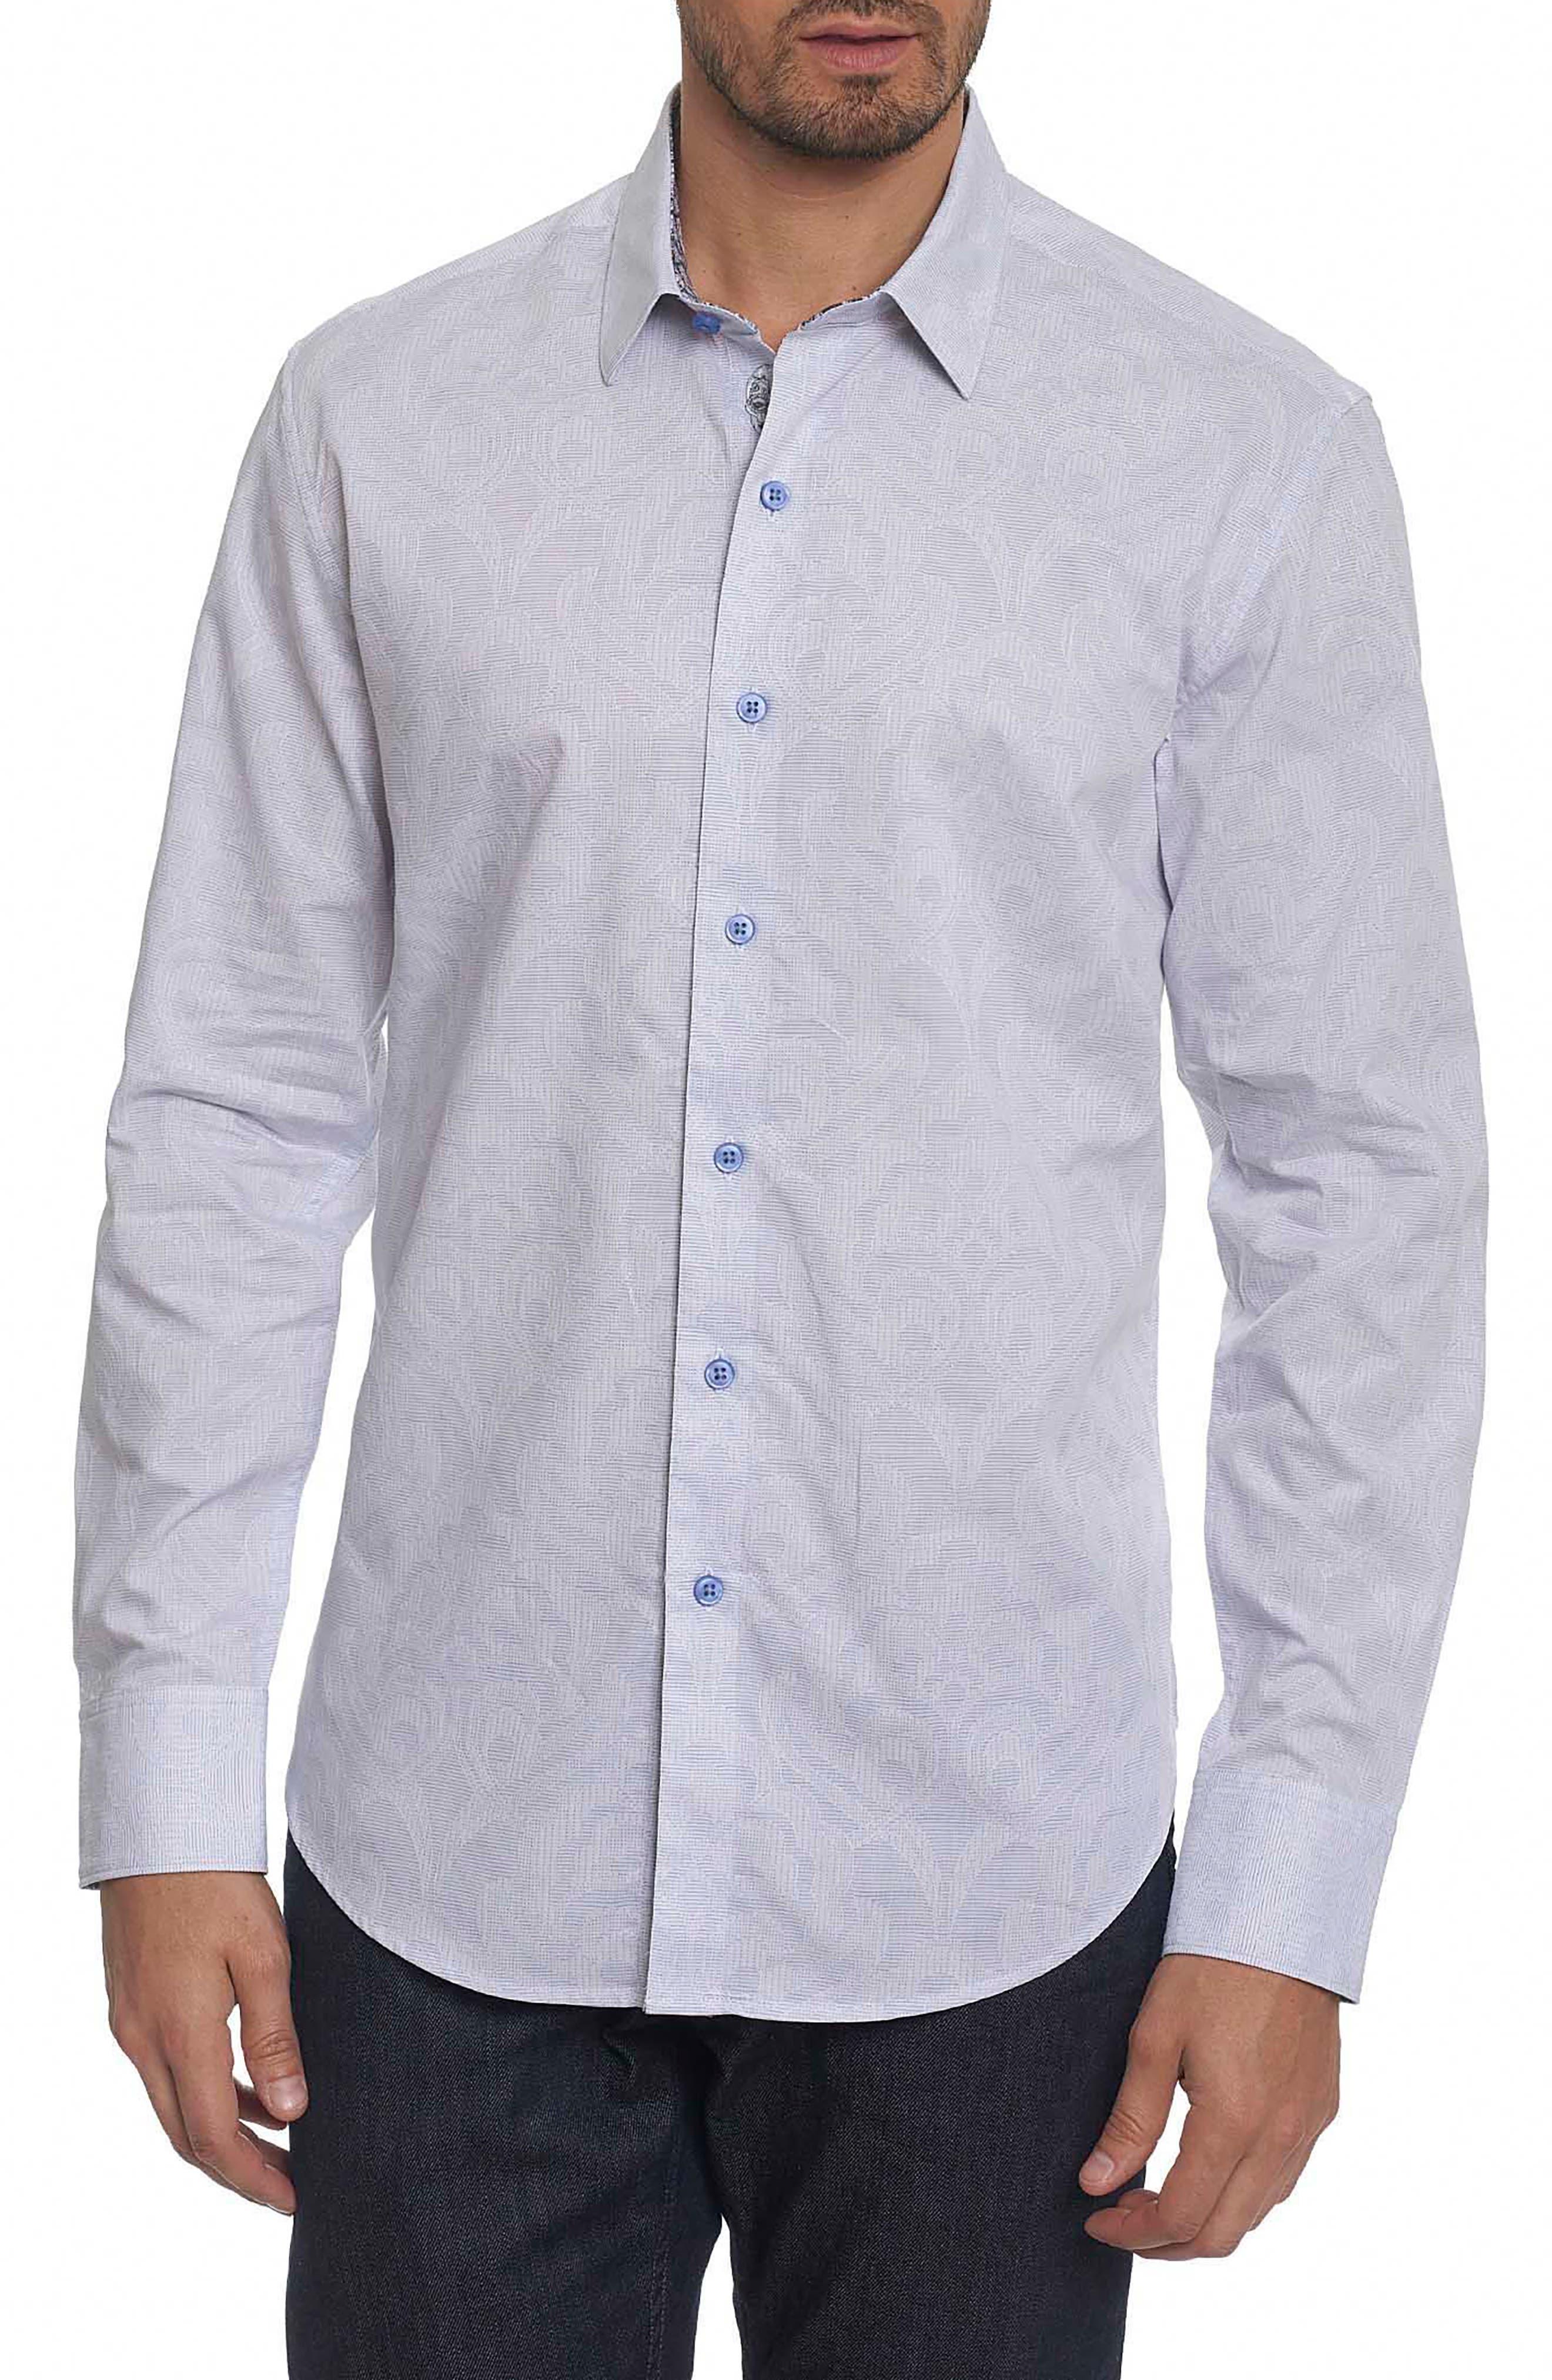 Alex Bay Classic Fit Sport Shirt,                         Main,                         color, White